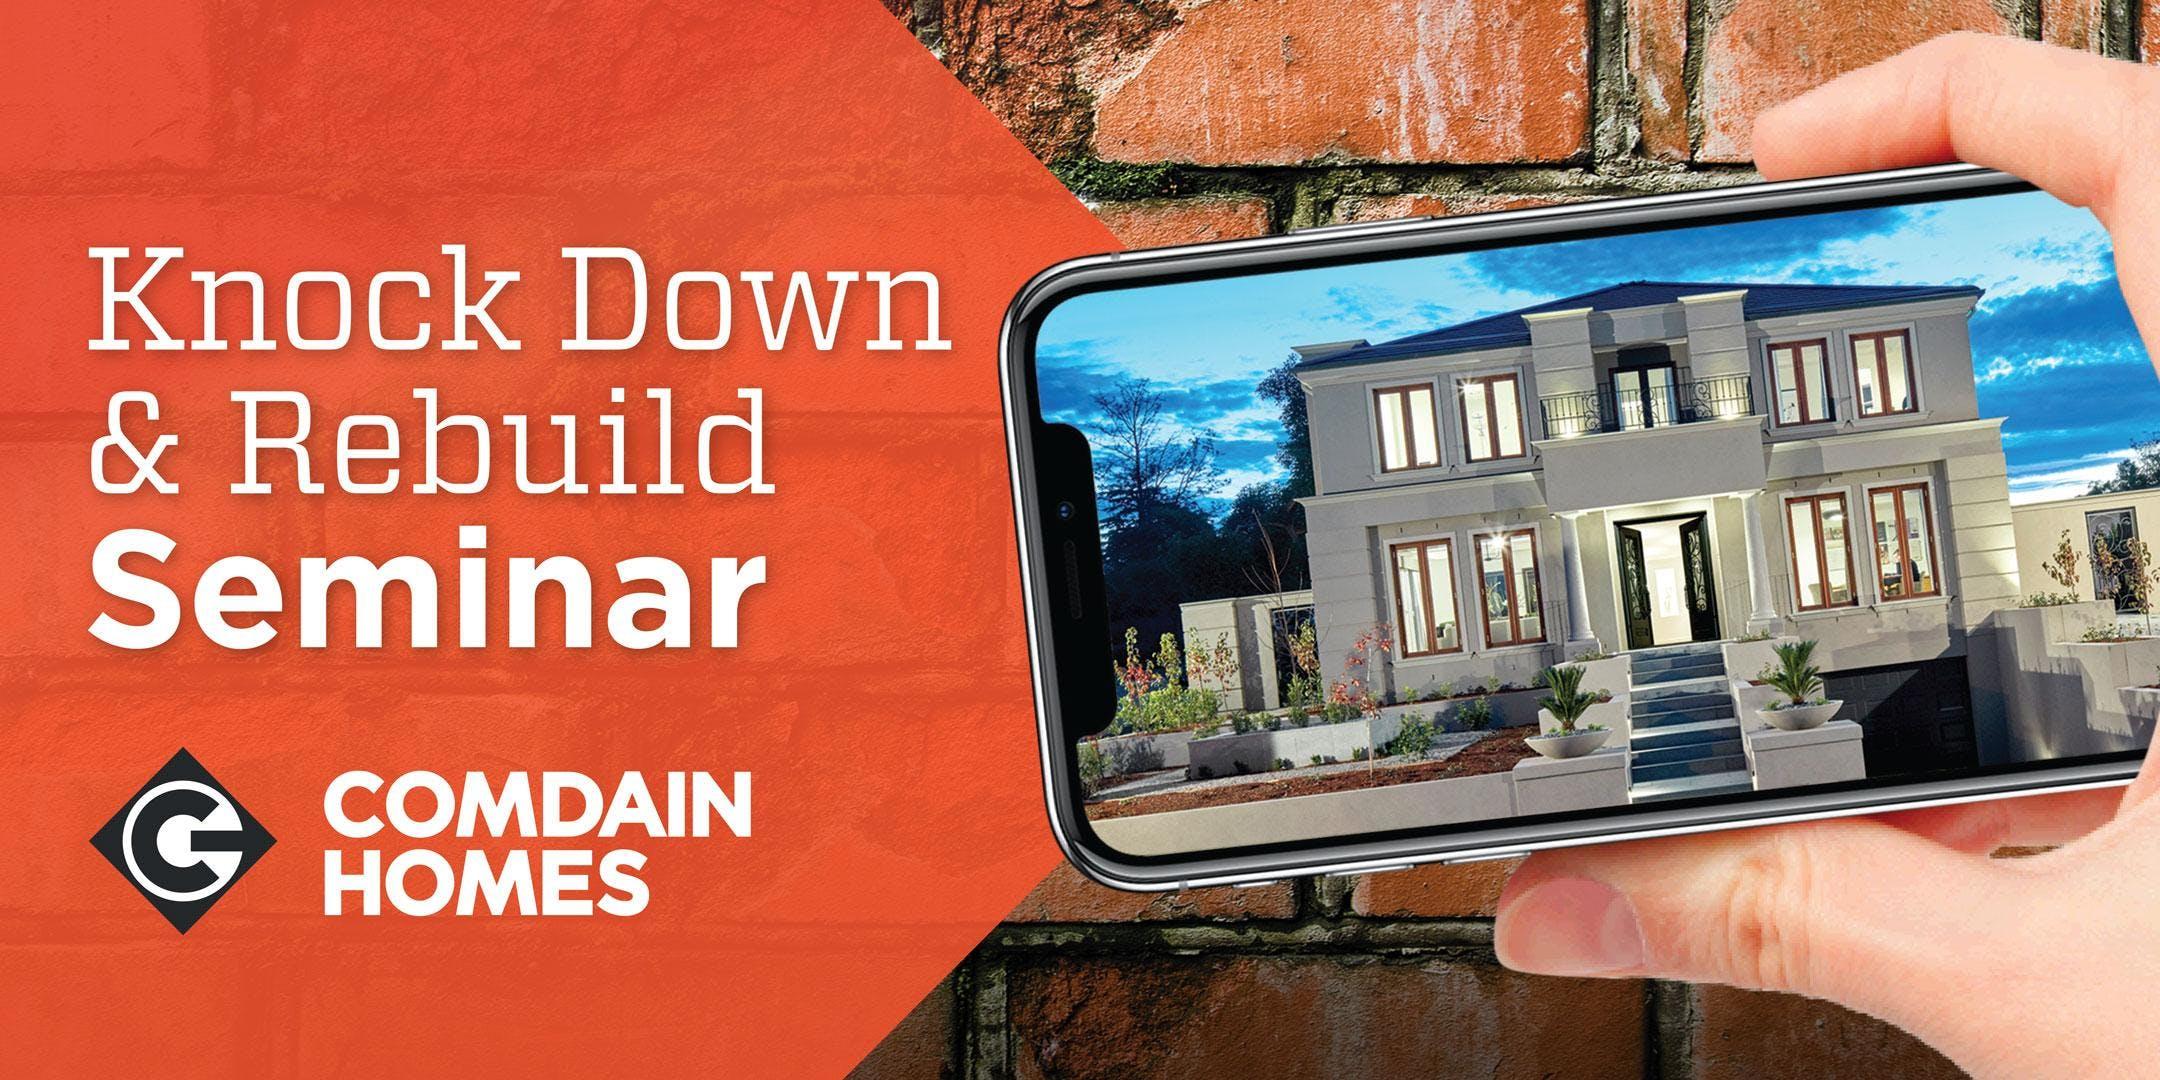 20 March Knock Down Rebuild Seminar with Comd